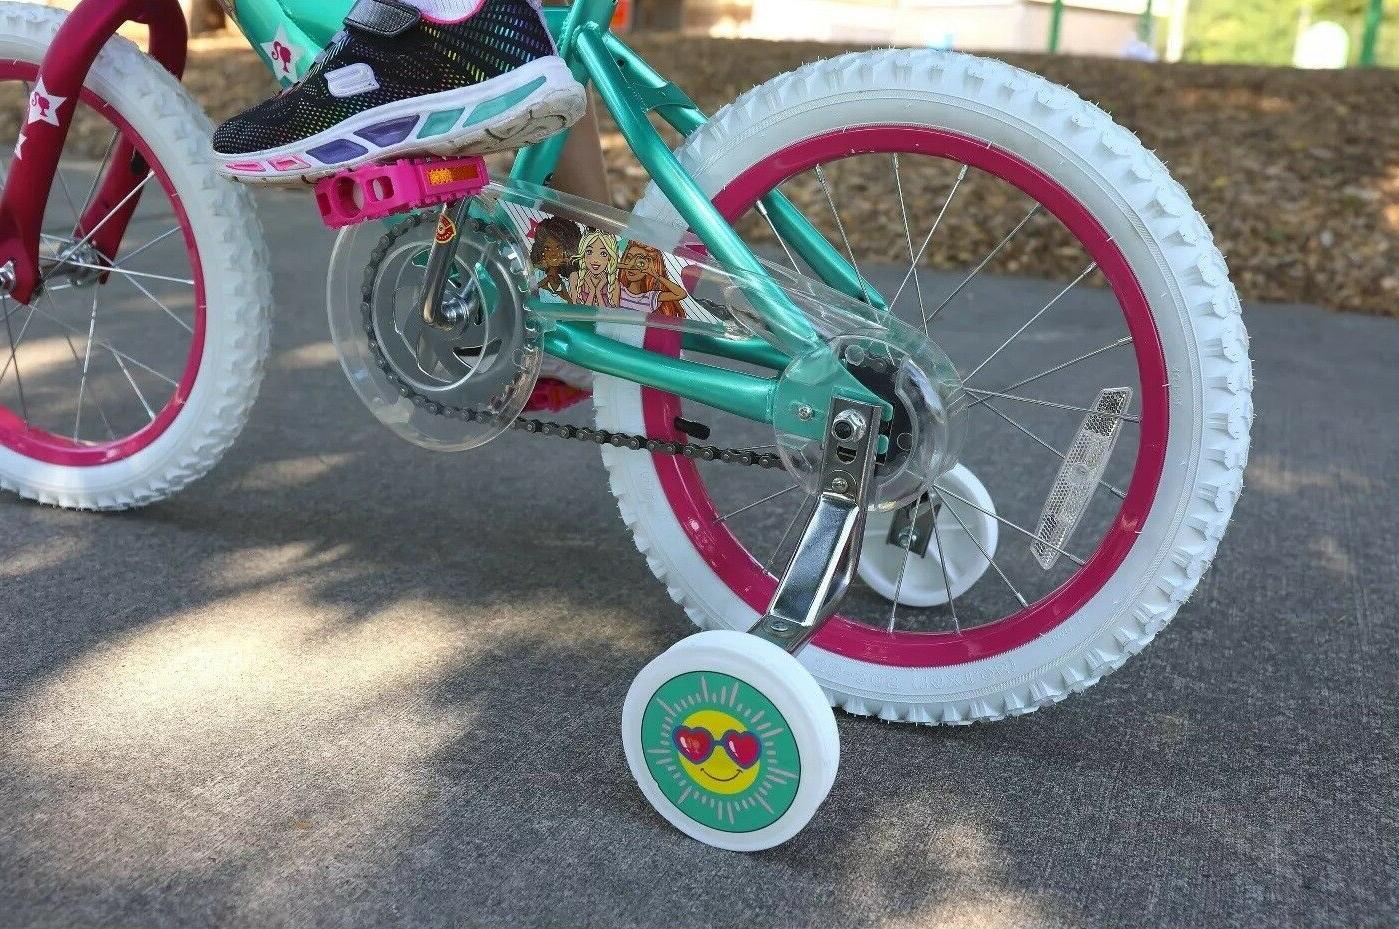 Barbie Girls Bicycle Minibike and Bag 4-7 yr